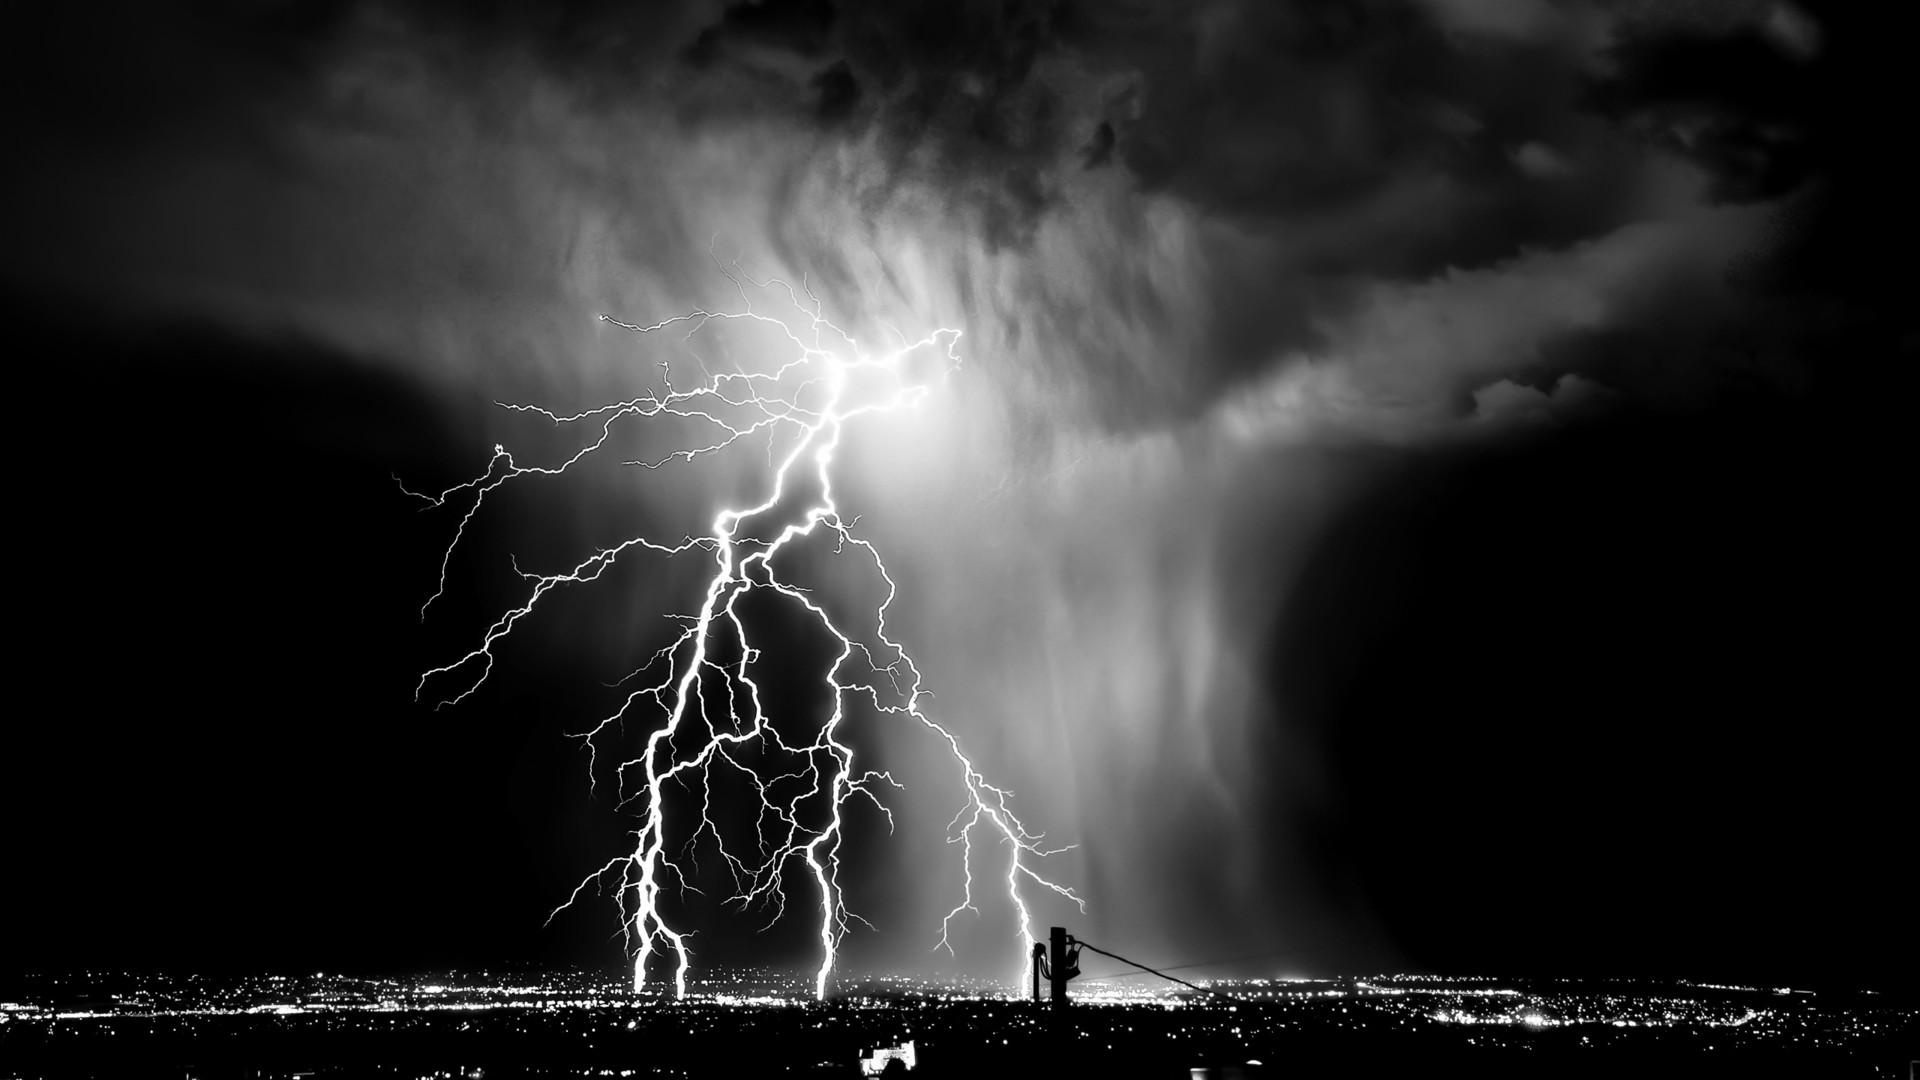 Black and White Lightning Hd